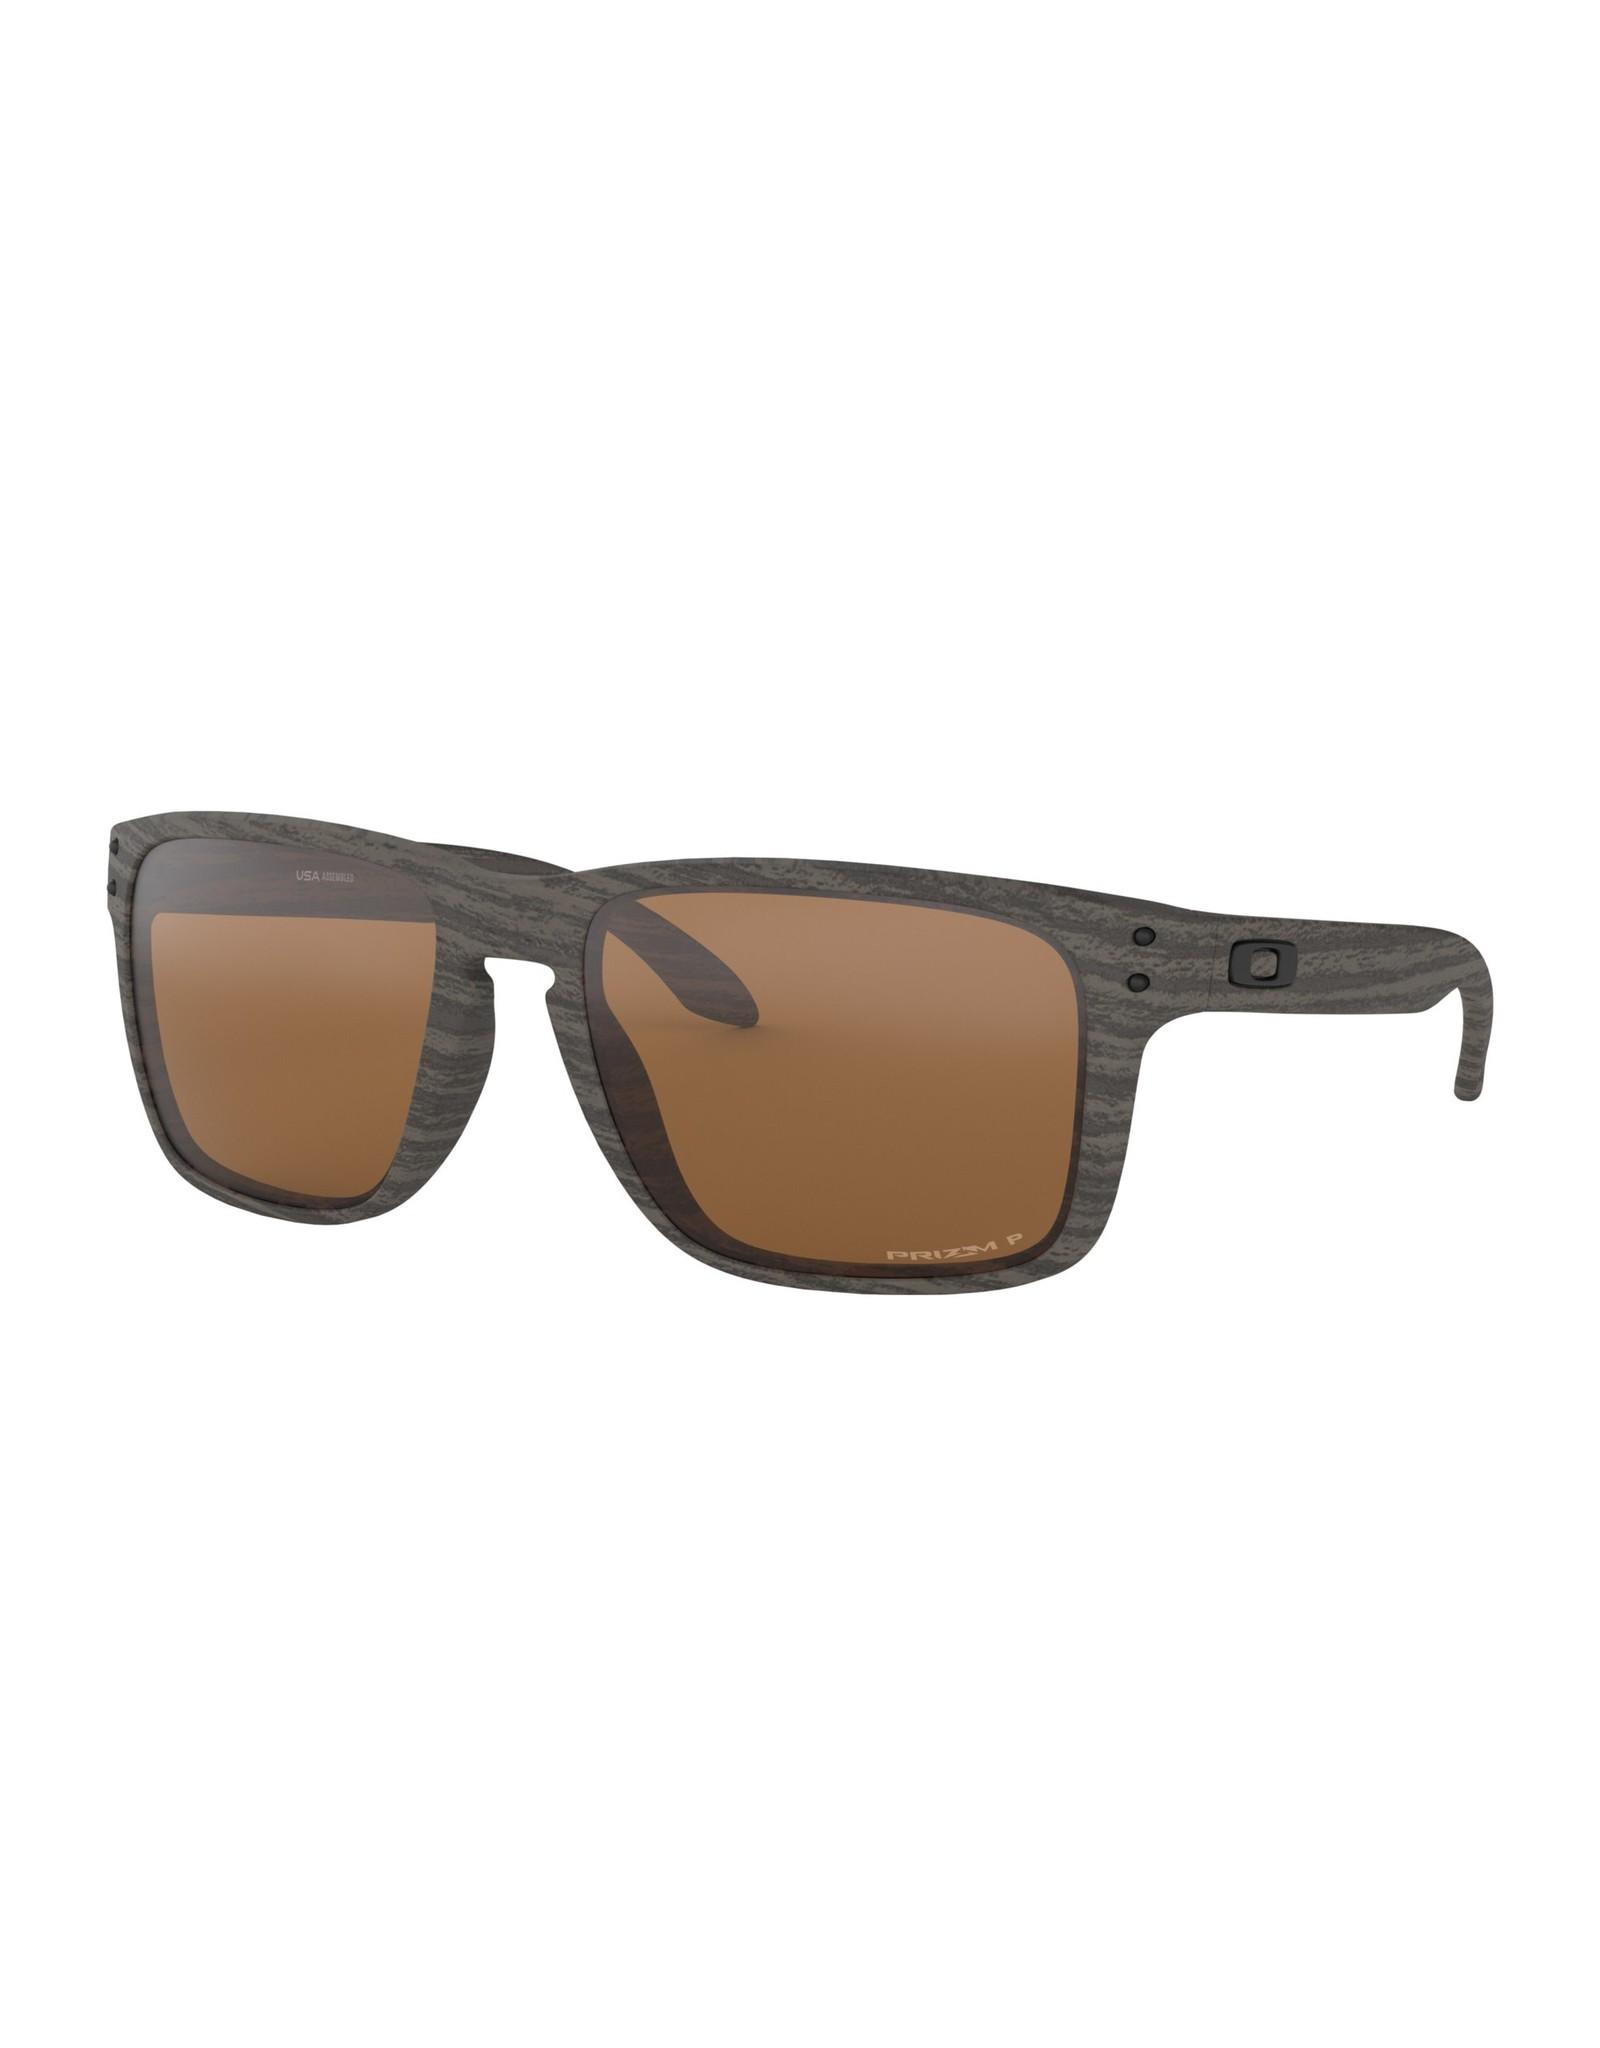 Oakley Oakley Holbrook XL Sunglasses